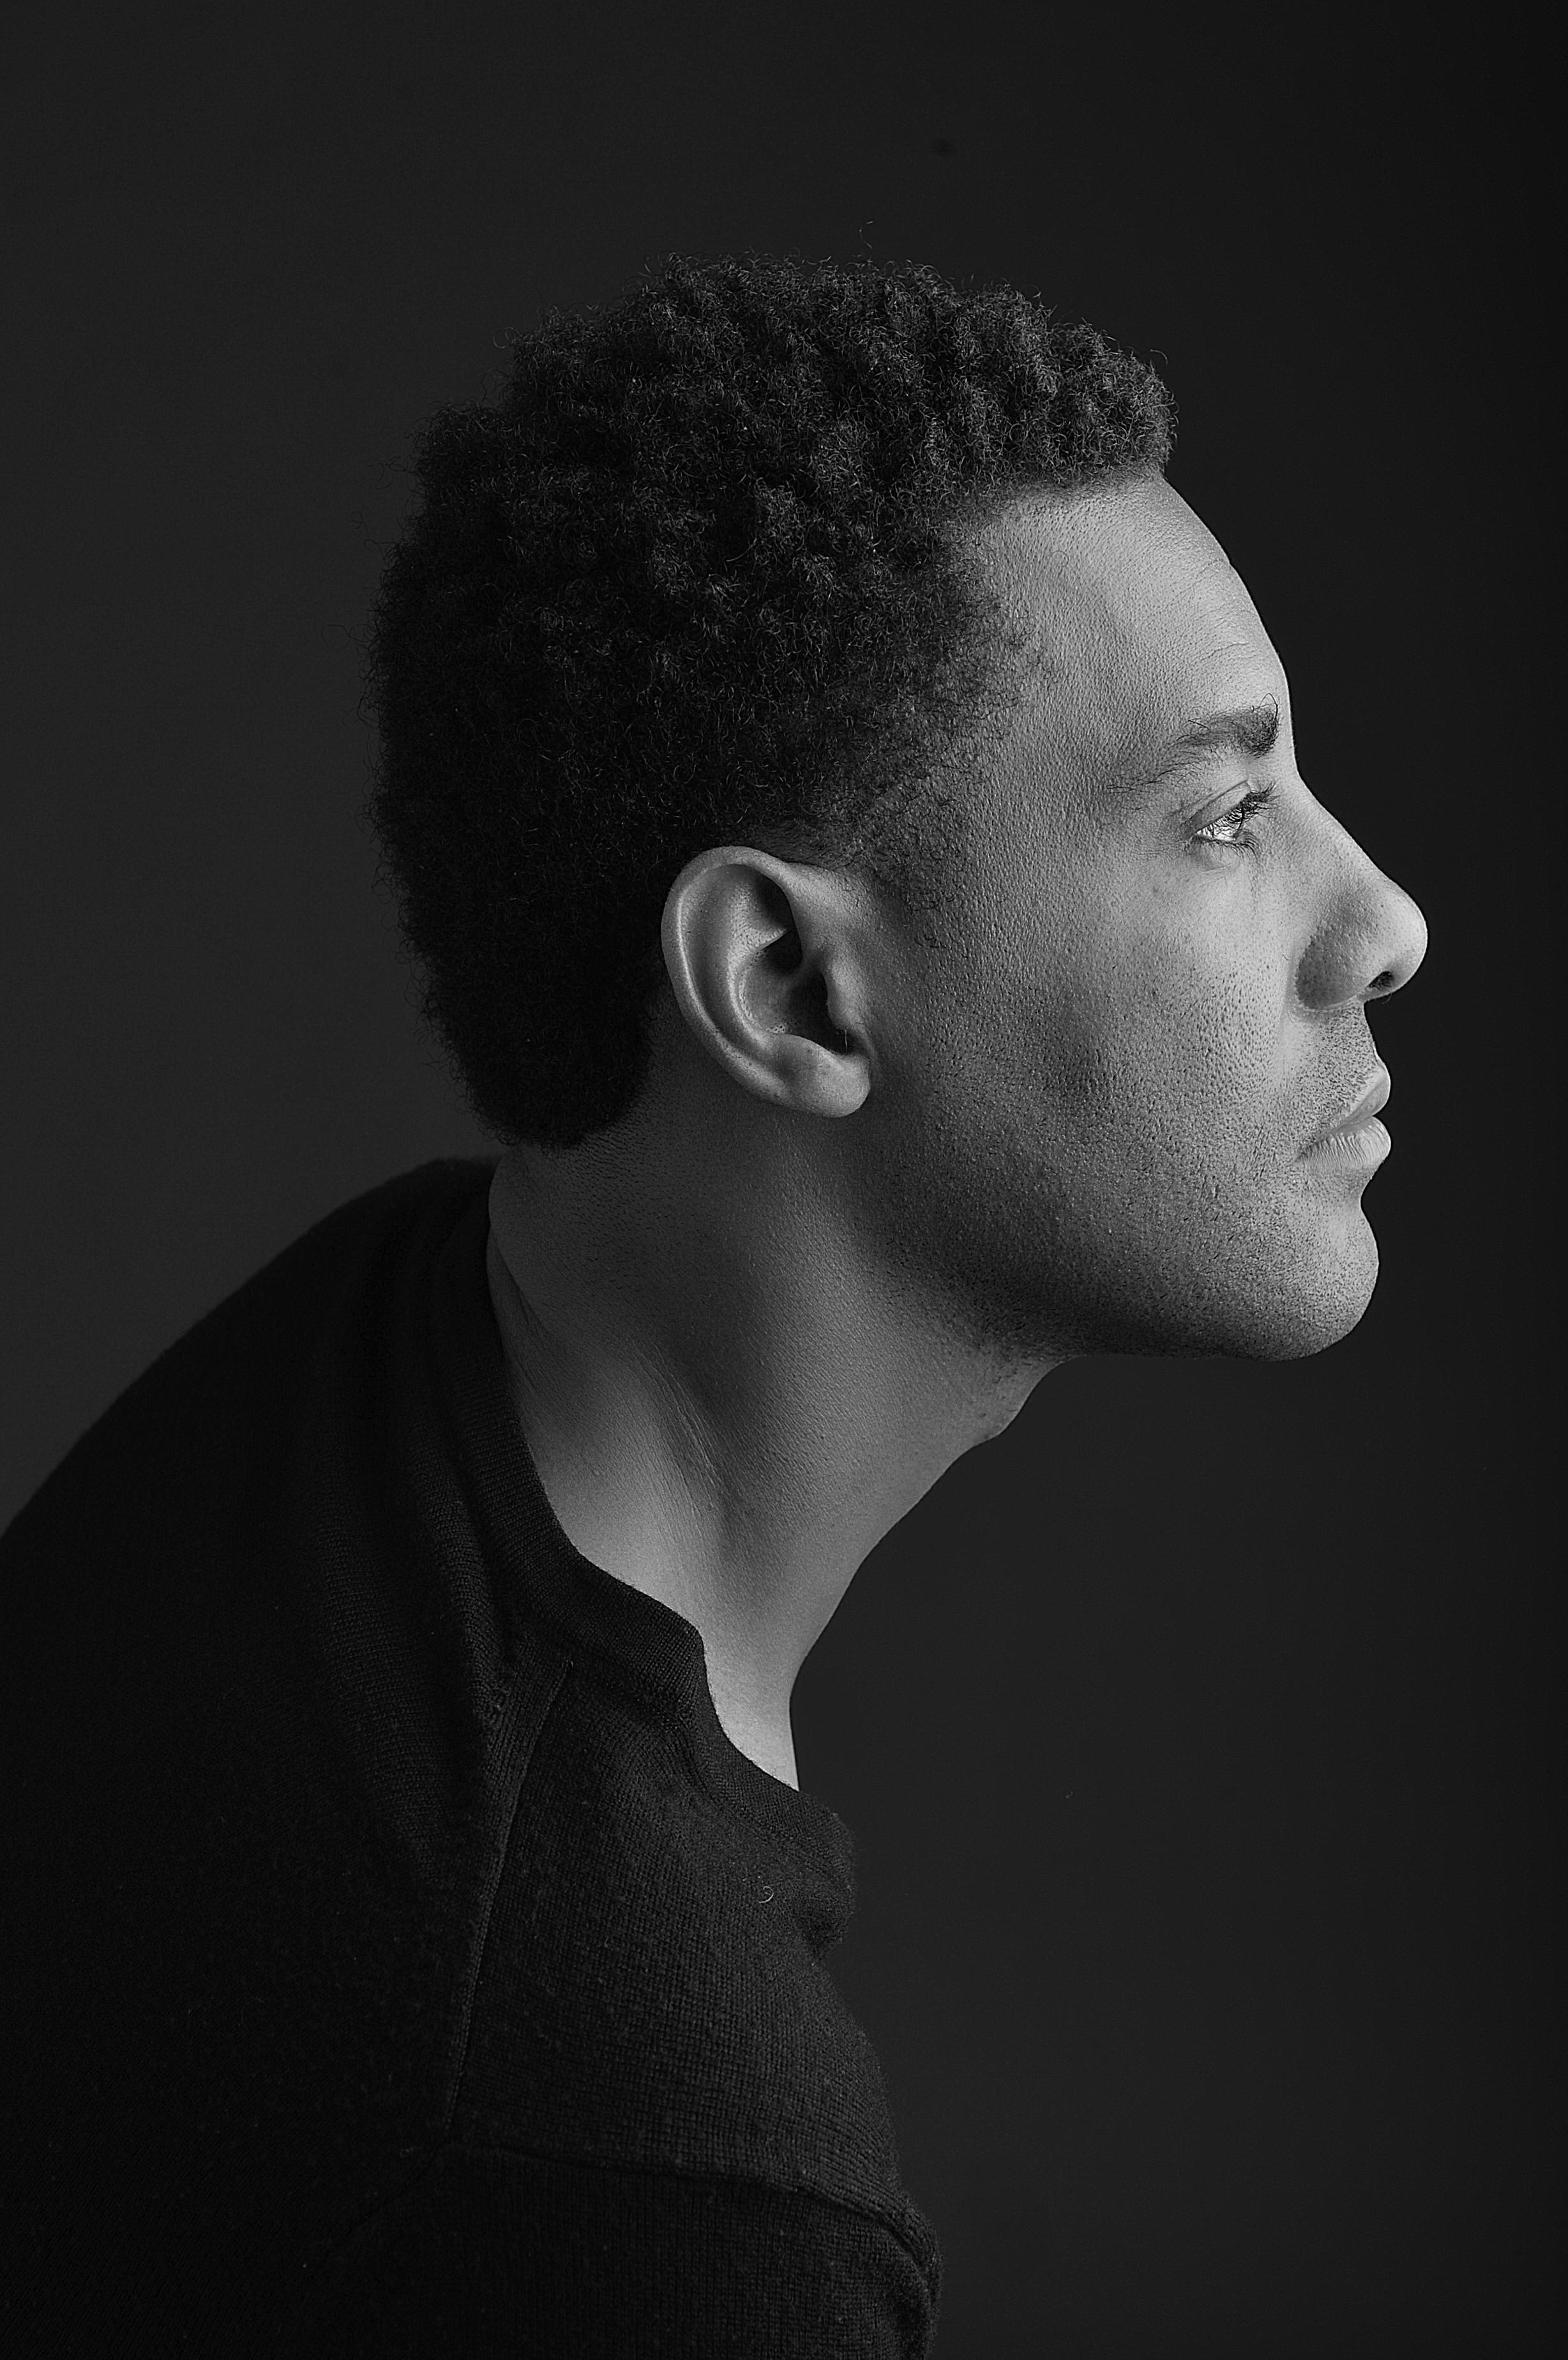 Photo of L. Lamar Wilson by Tyrus Ortega Gaines